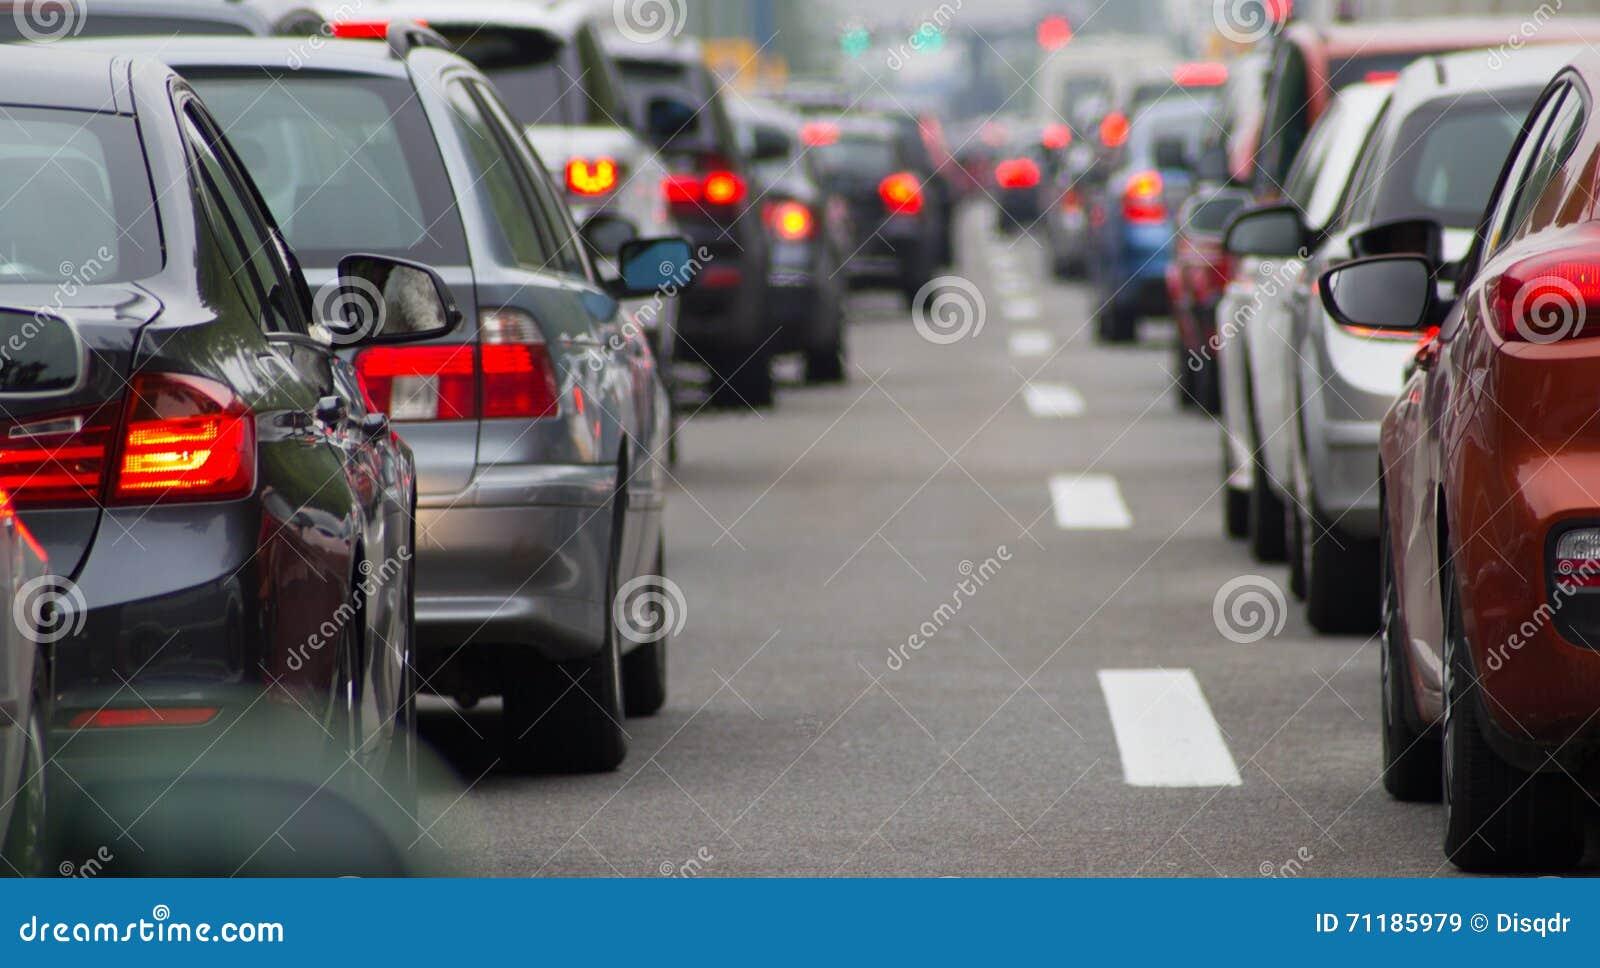 Автомобили на шоссе в заторе движения